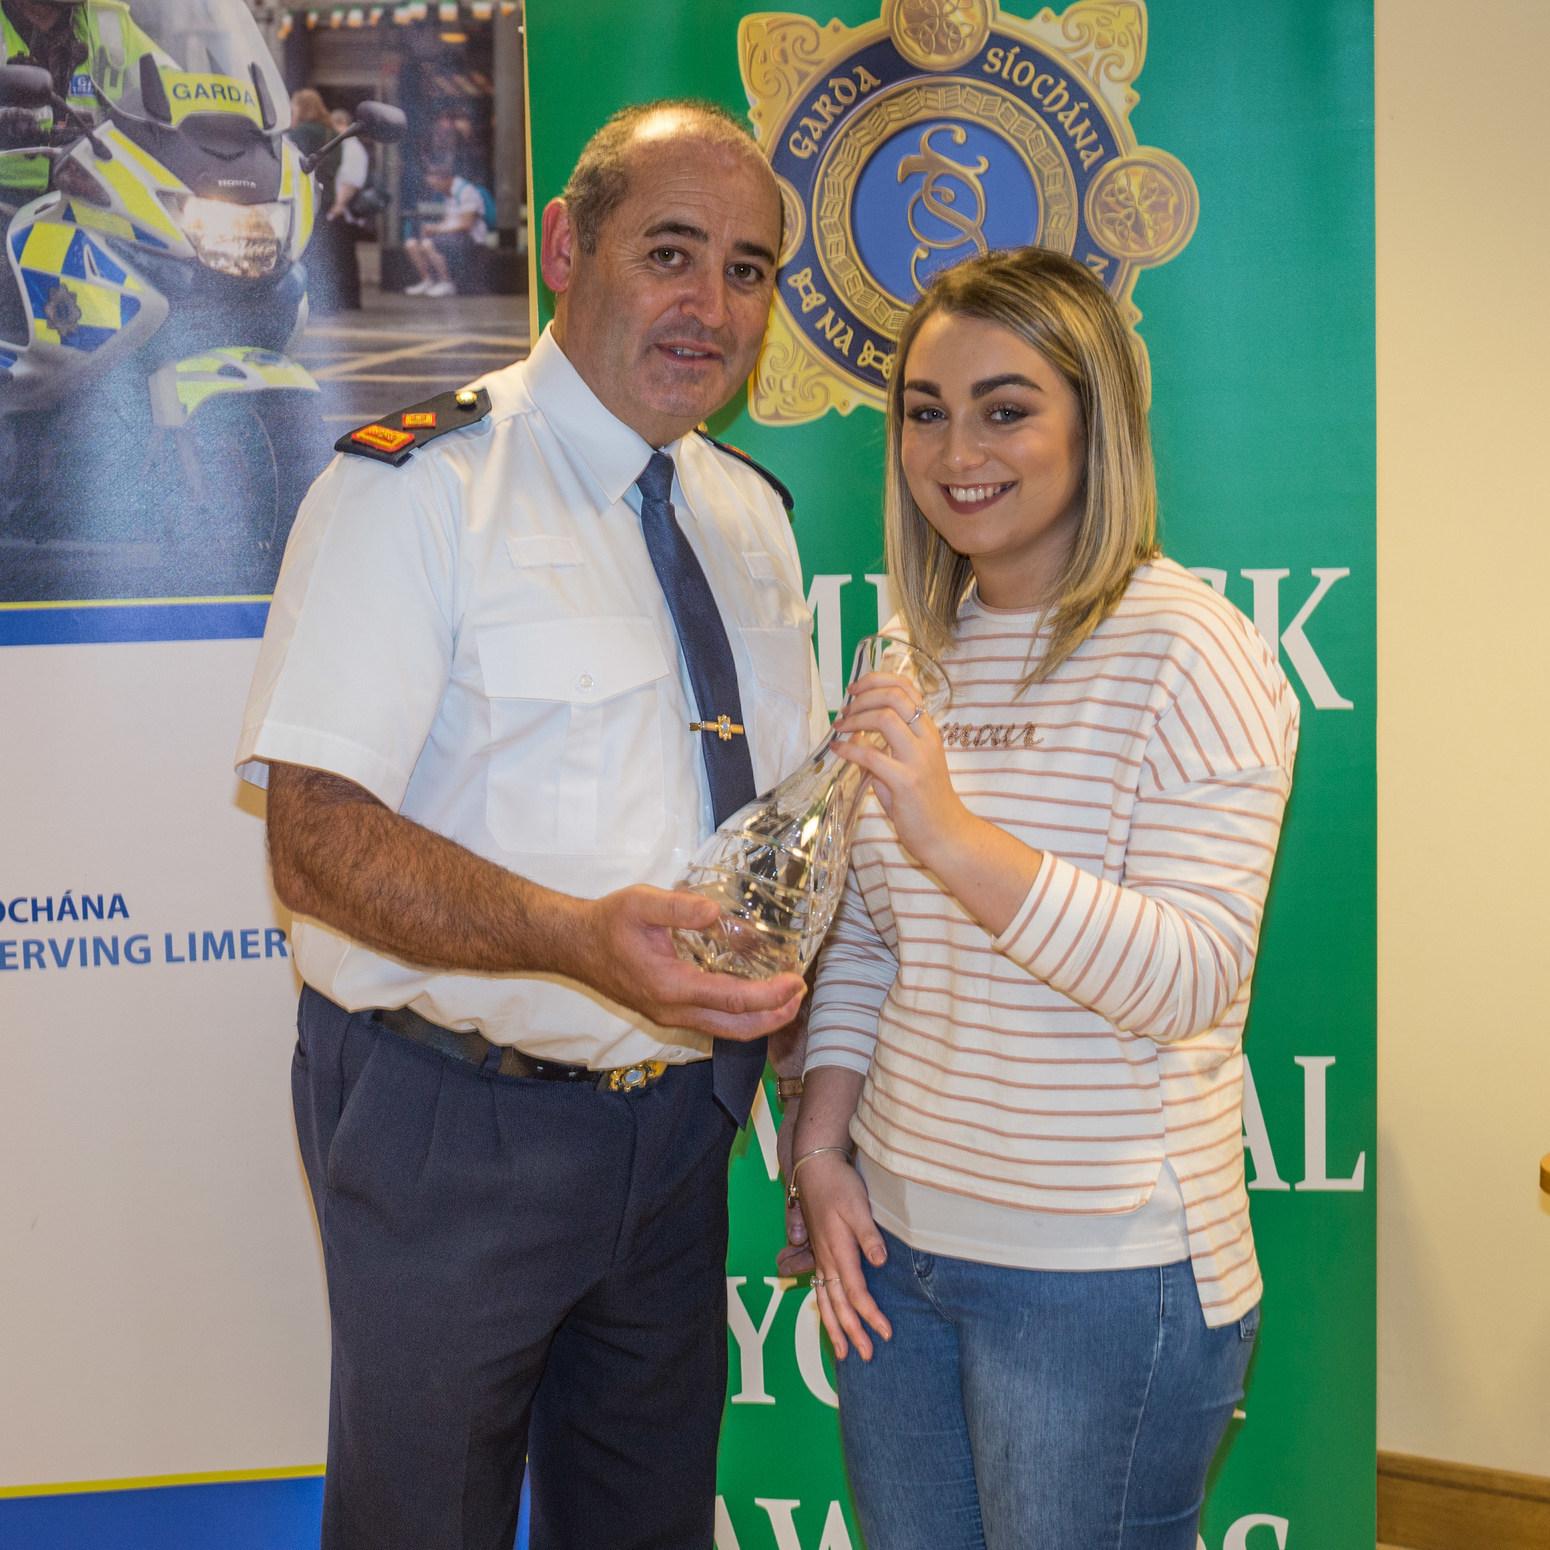 Limerick Garda Divisional youth Awards 2016